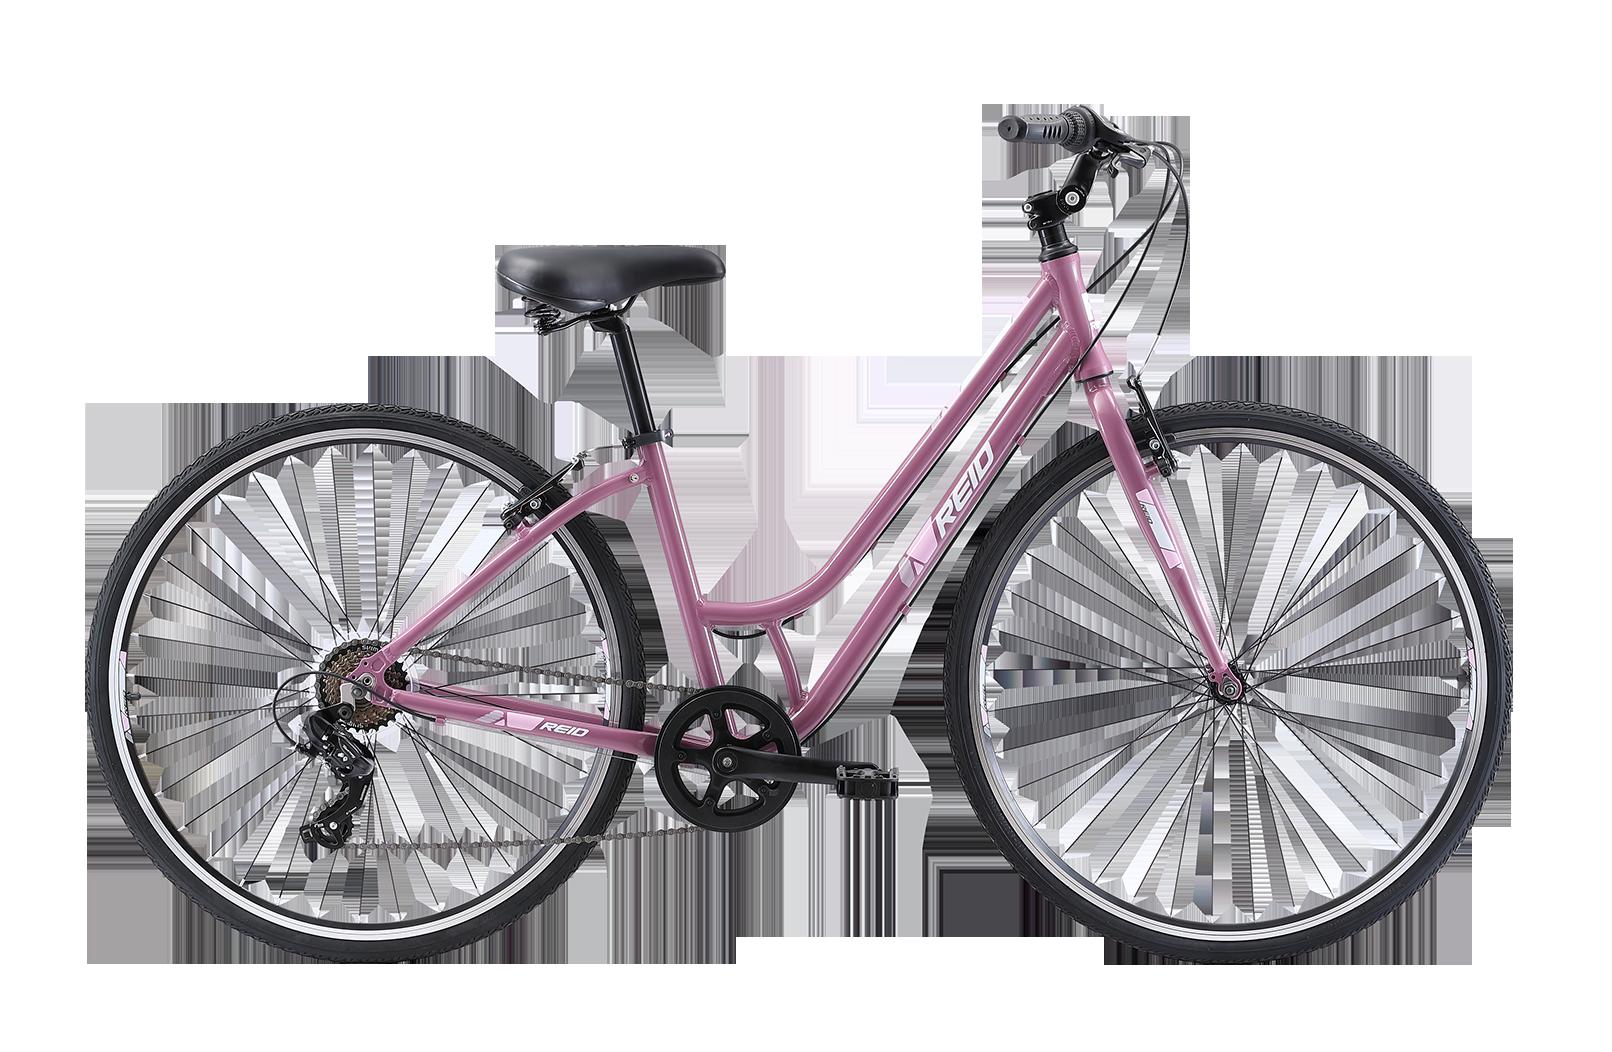 IMG 0021 3 - Reid ® - Comfort 1 Step Thru Bike 2020